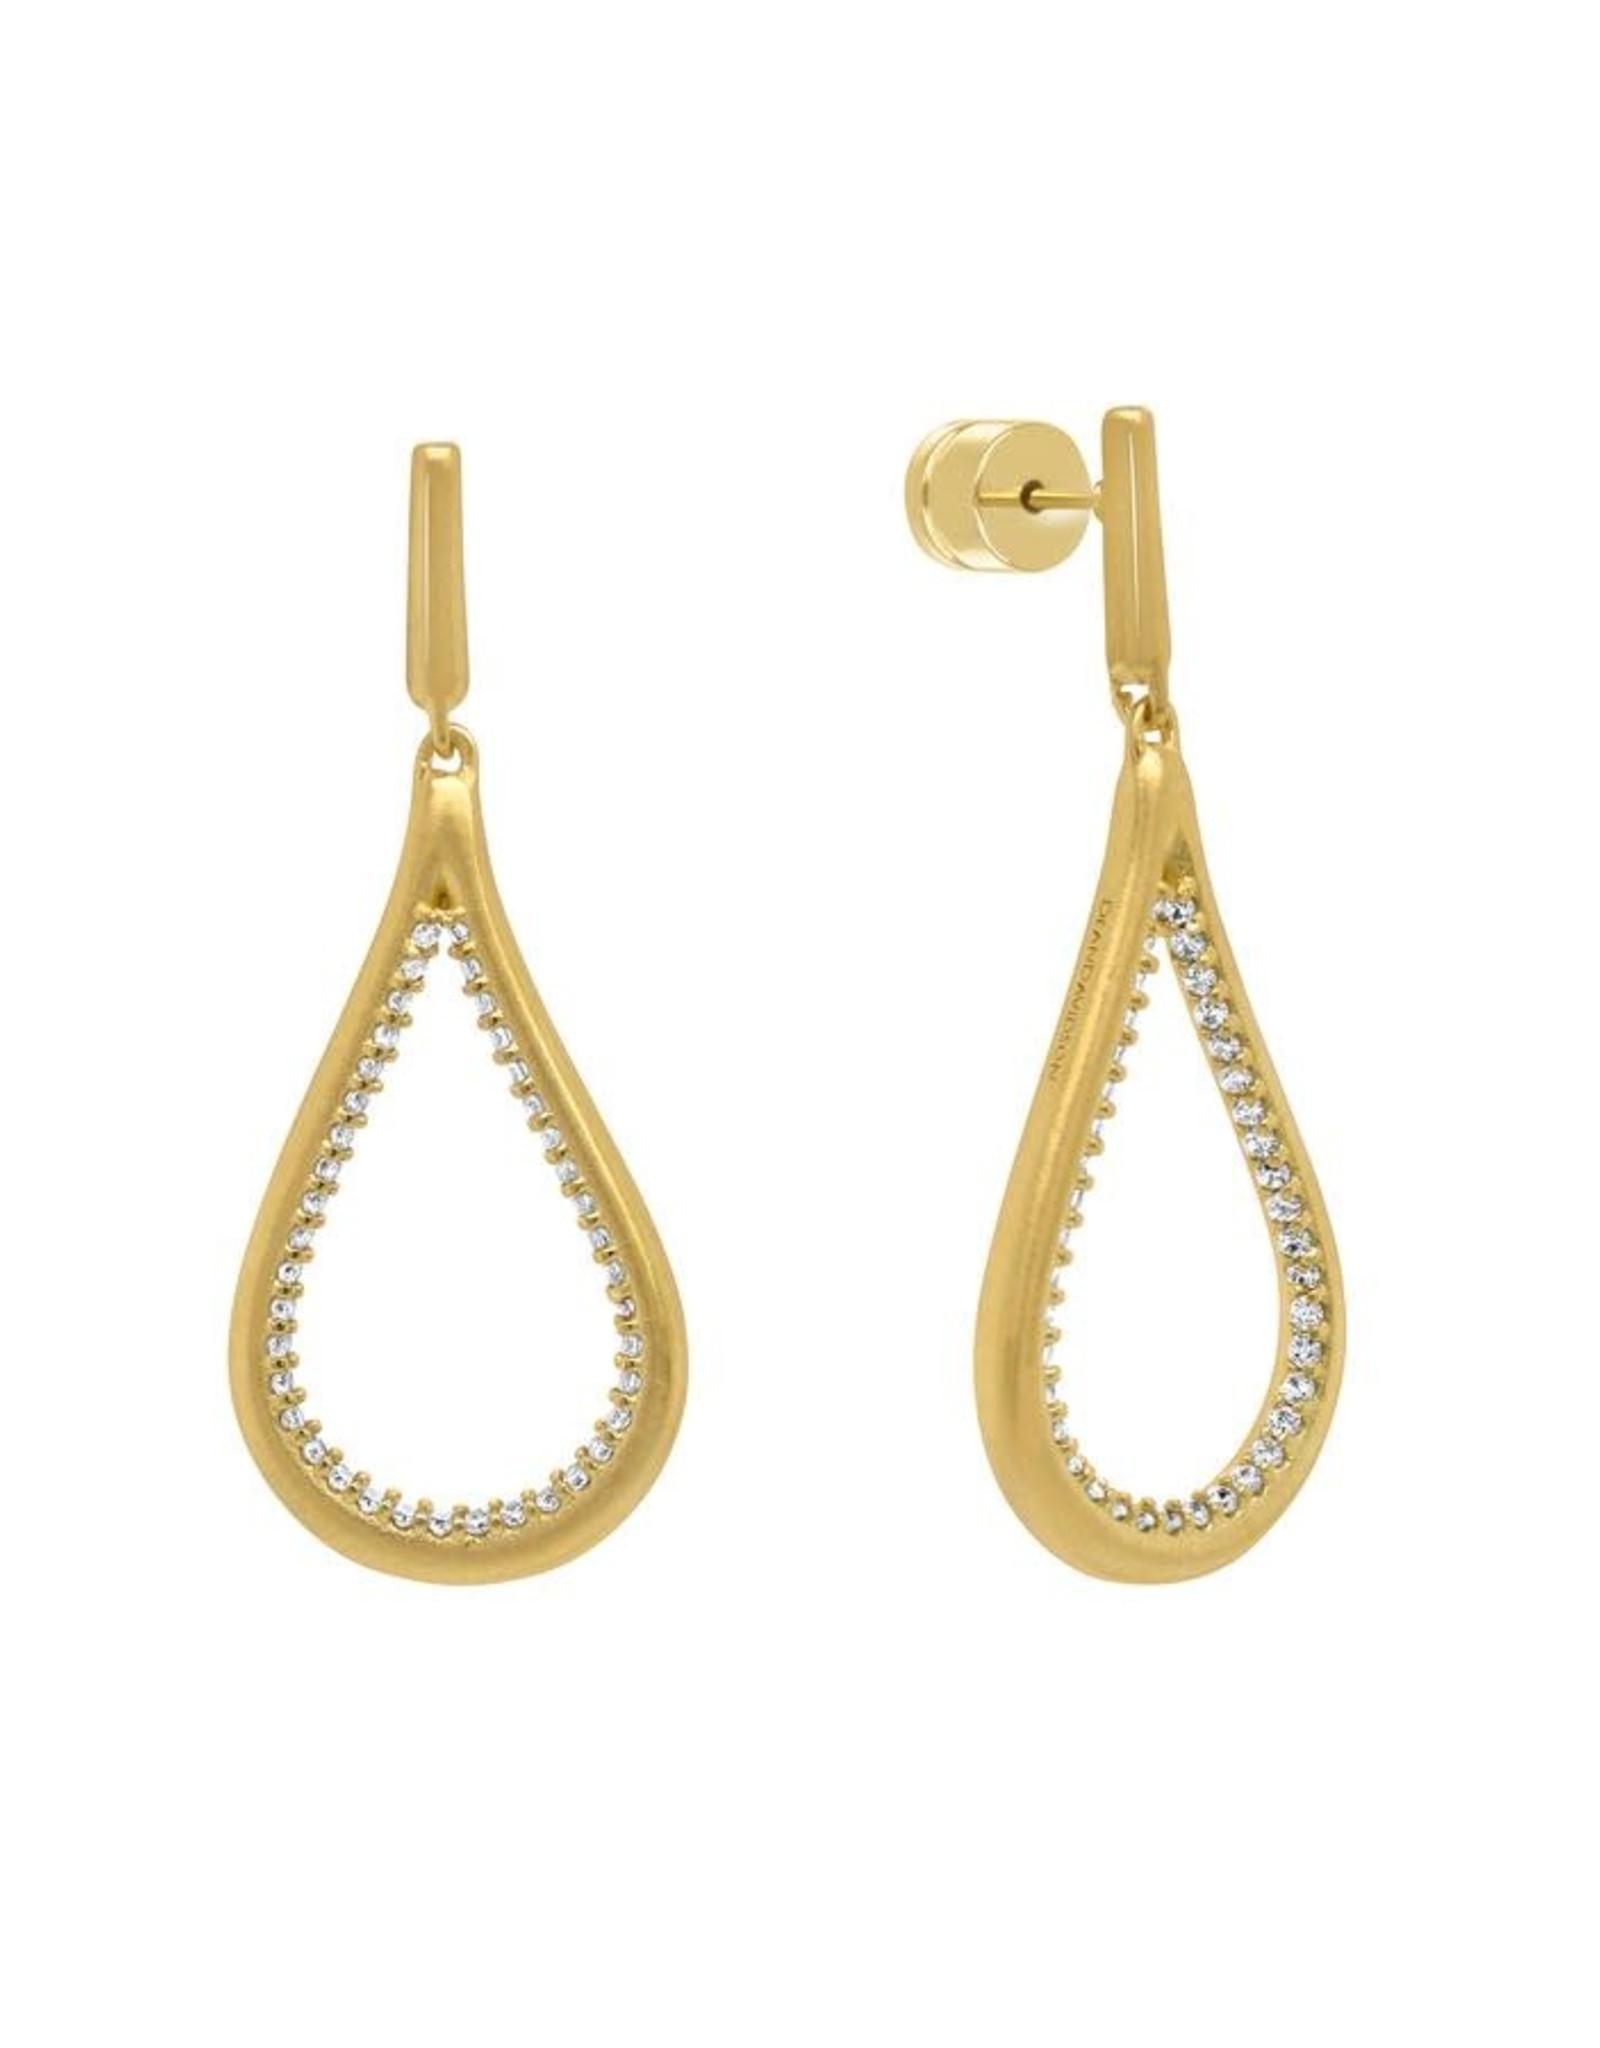 Dean Davidson White Topaz Pave Teardrop Earrings